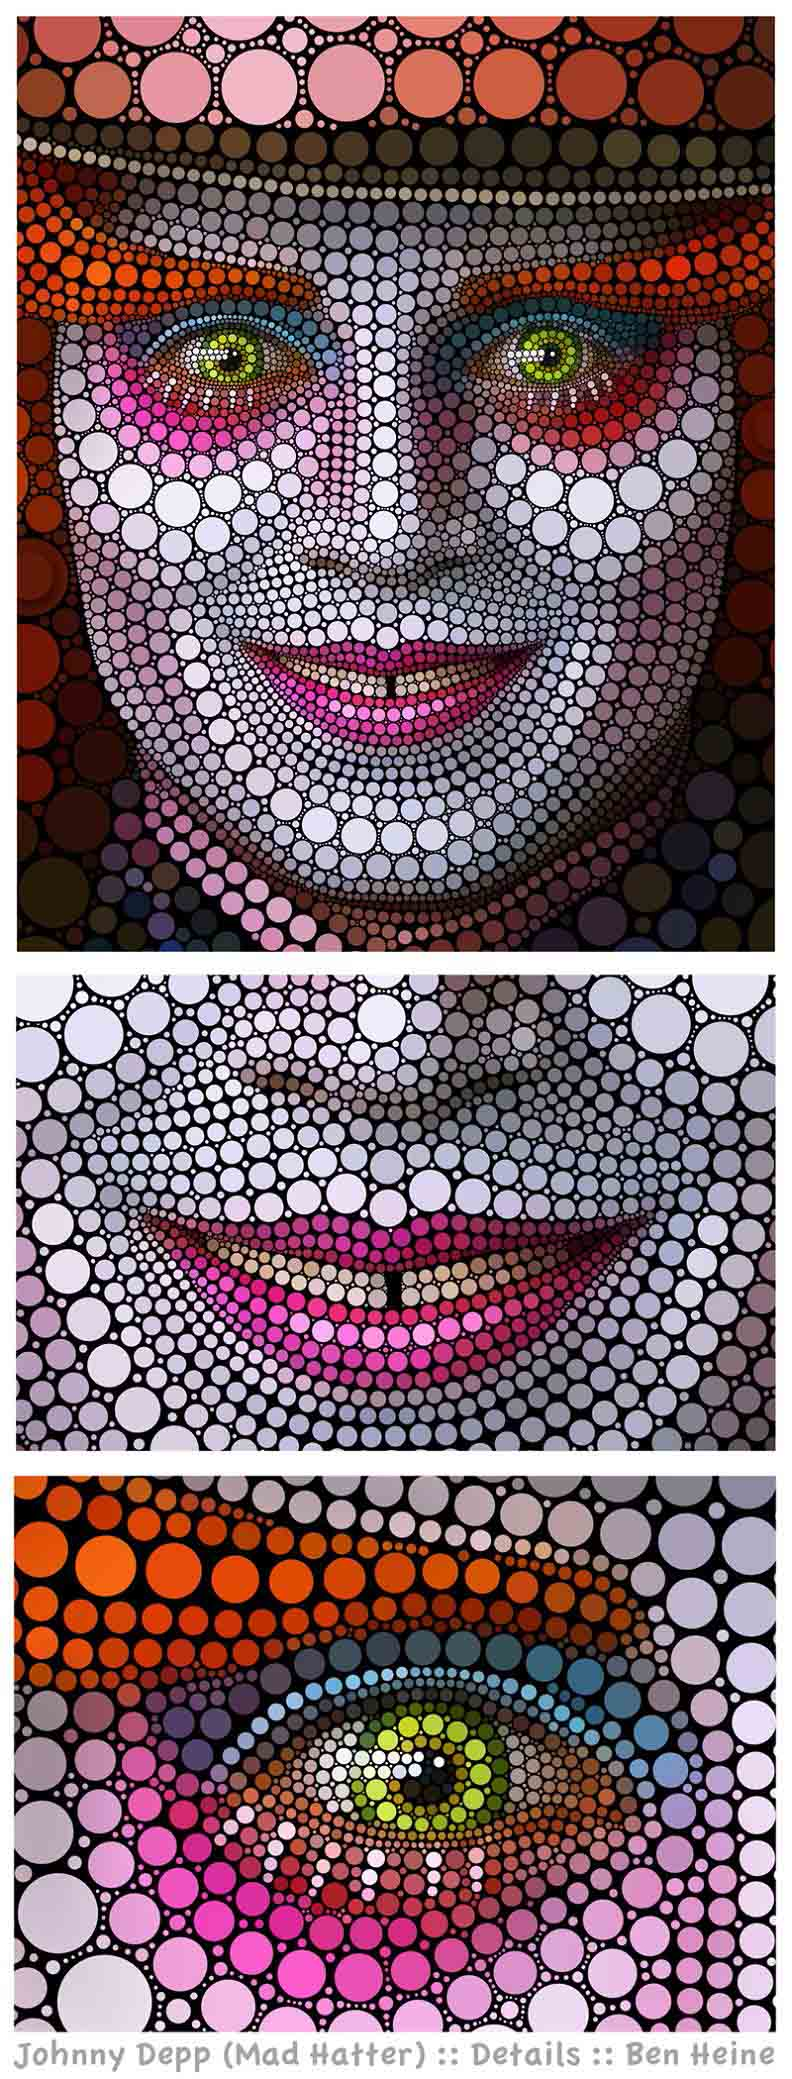 guide to circle art ben heine Art Made Entirely of Circles by Ben Heine